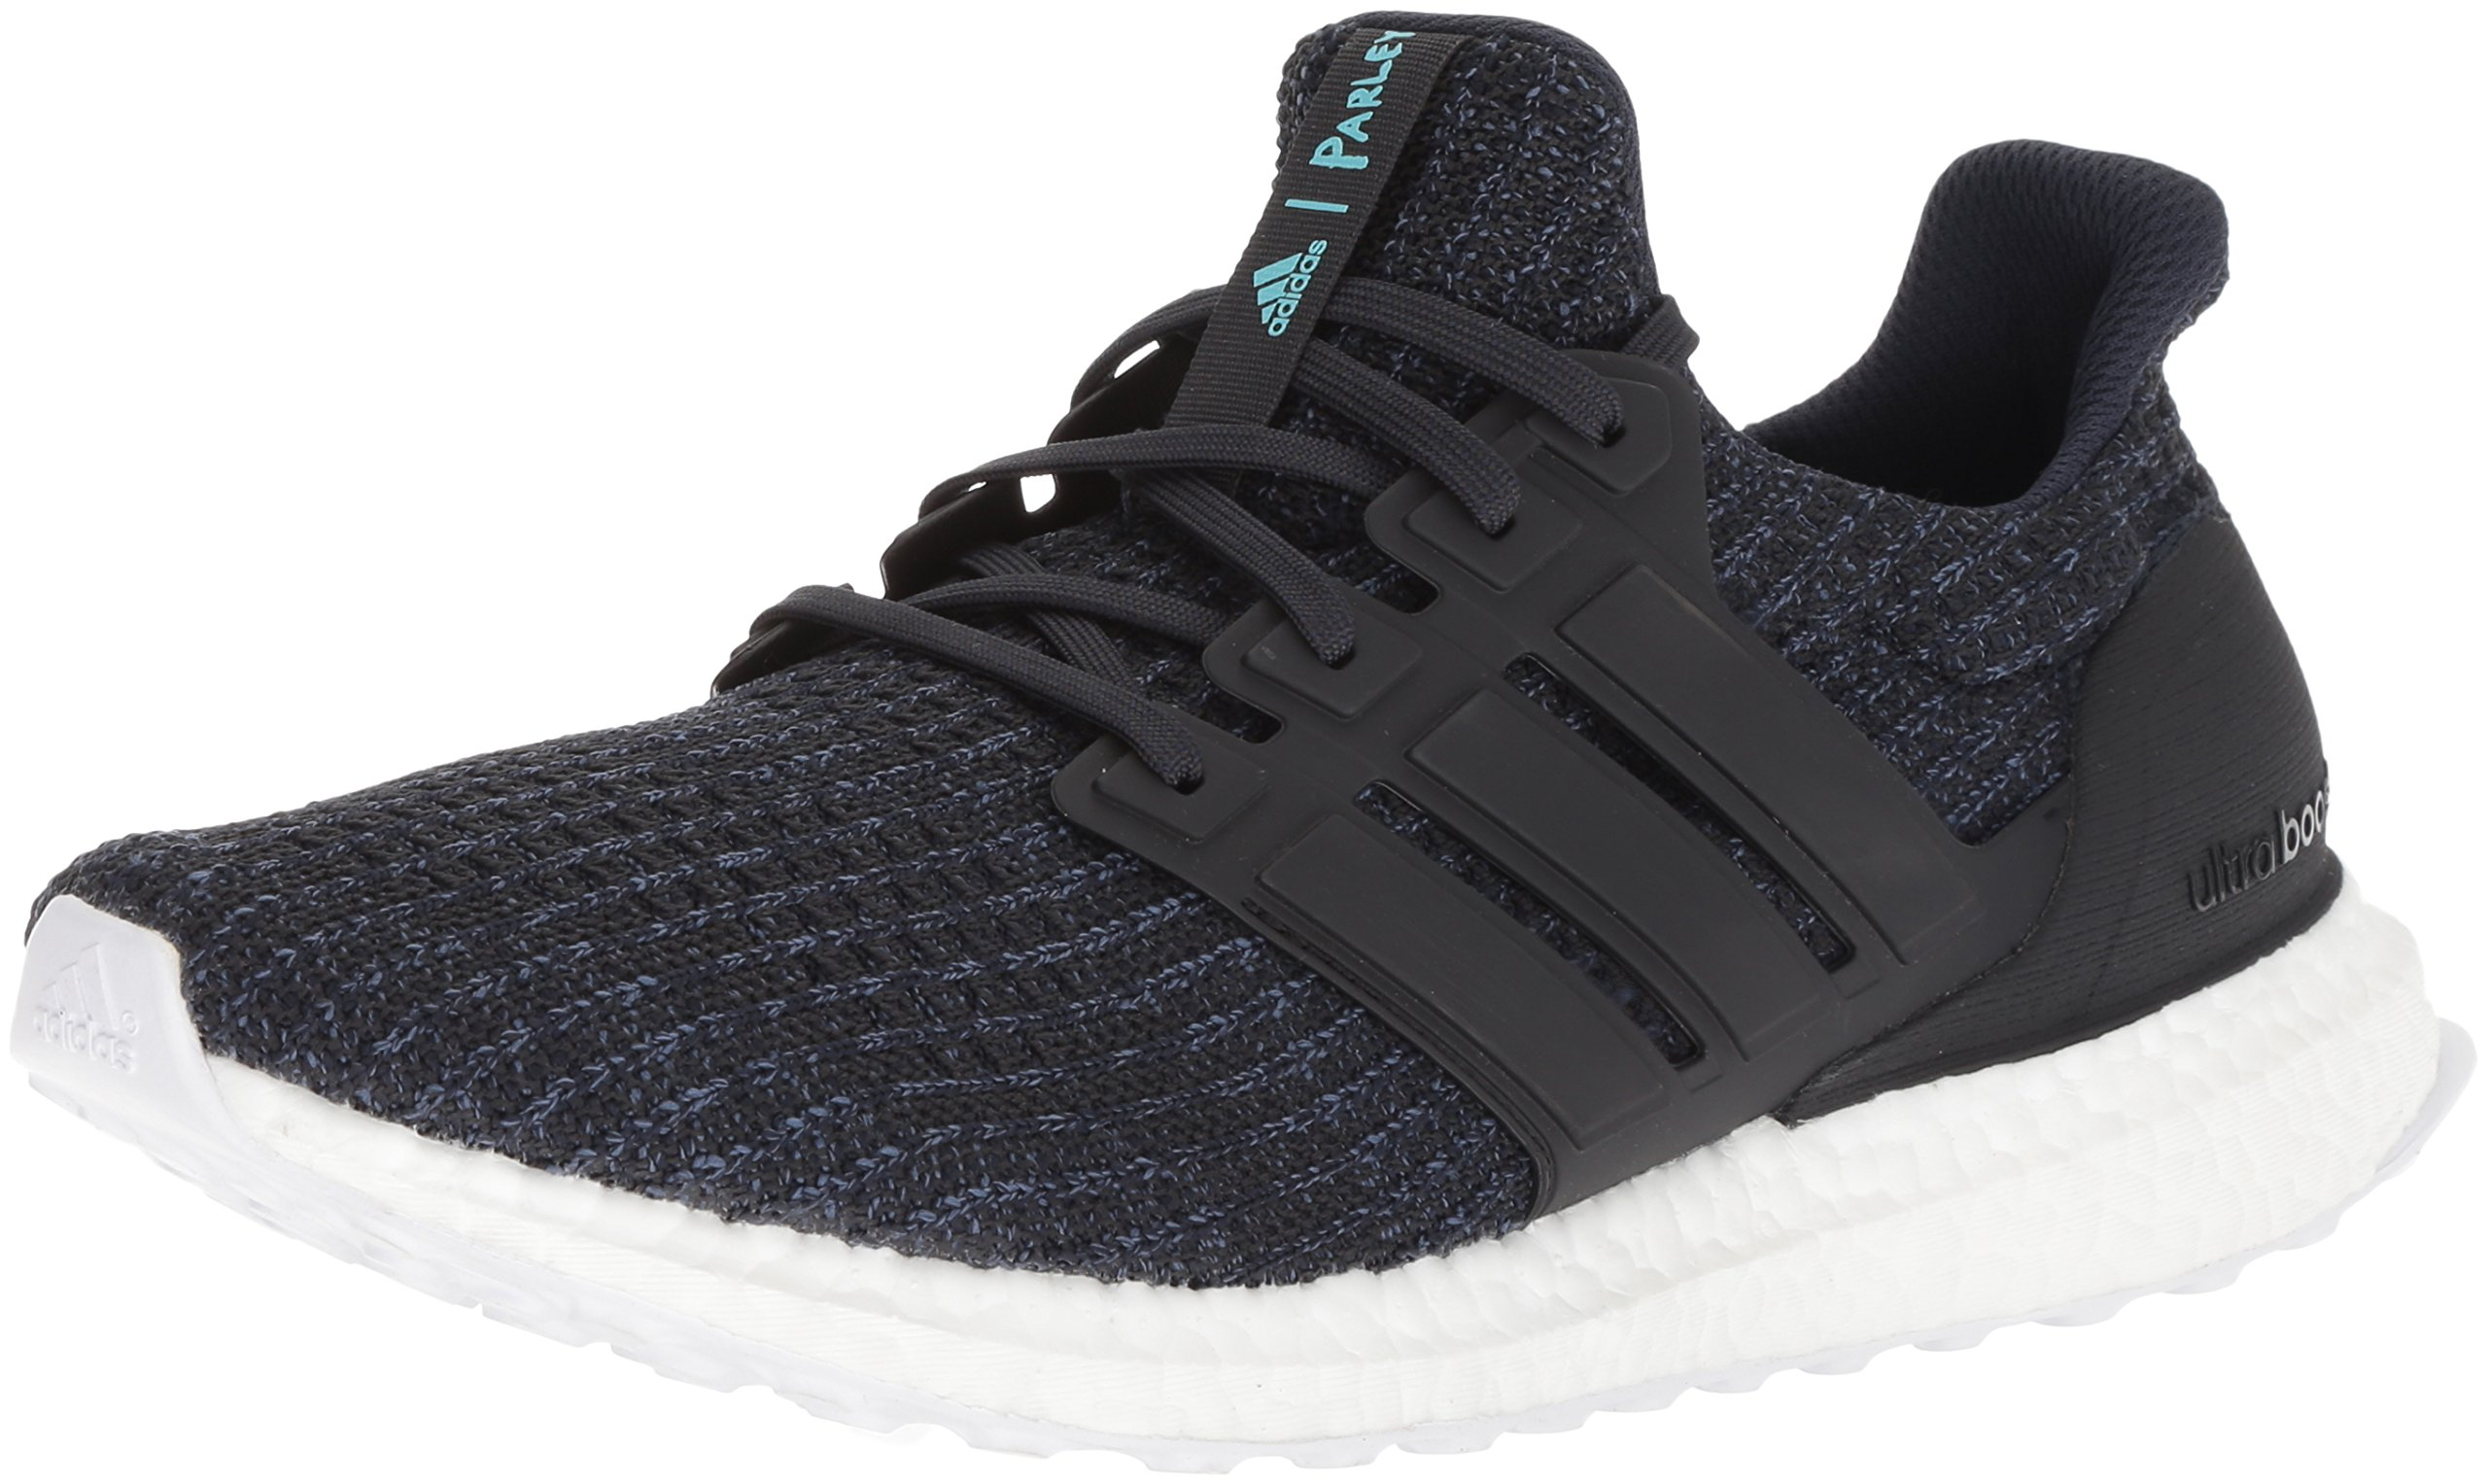 adidas Men's UltraBOOST Parley Running Shoe, legend ink/carbon/blue spirit, 4 M US